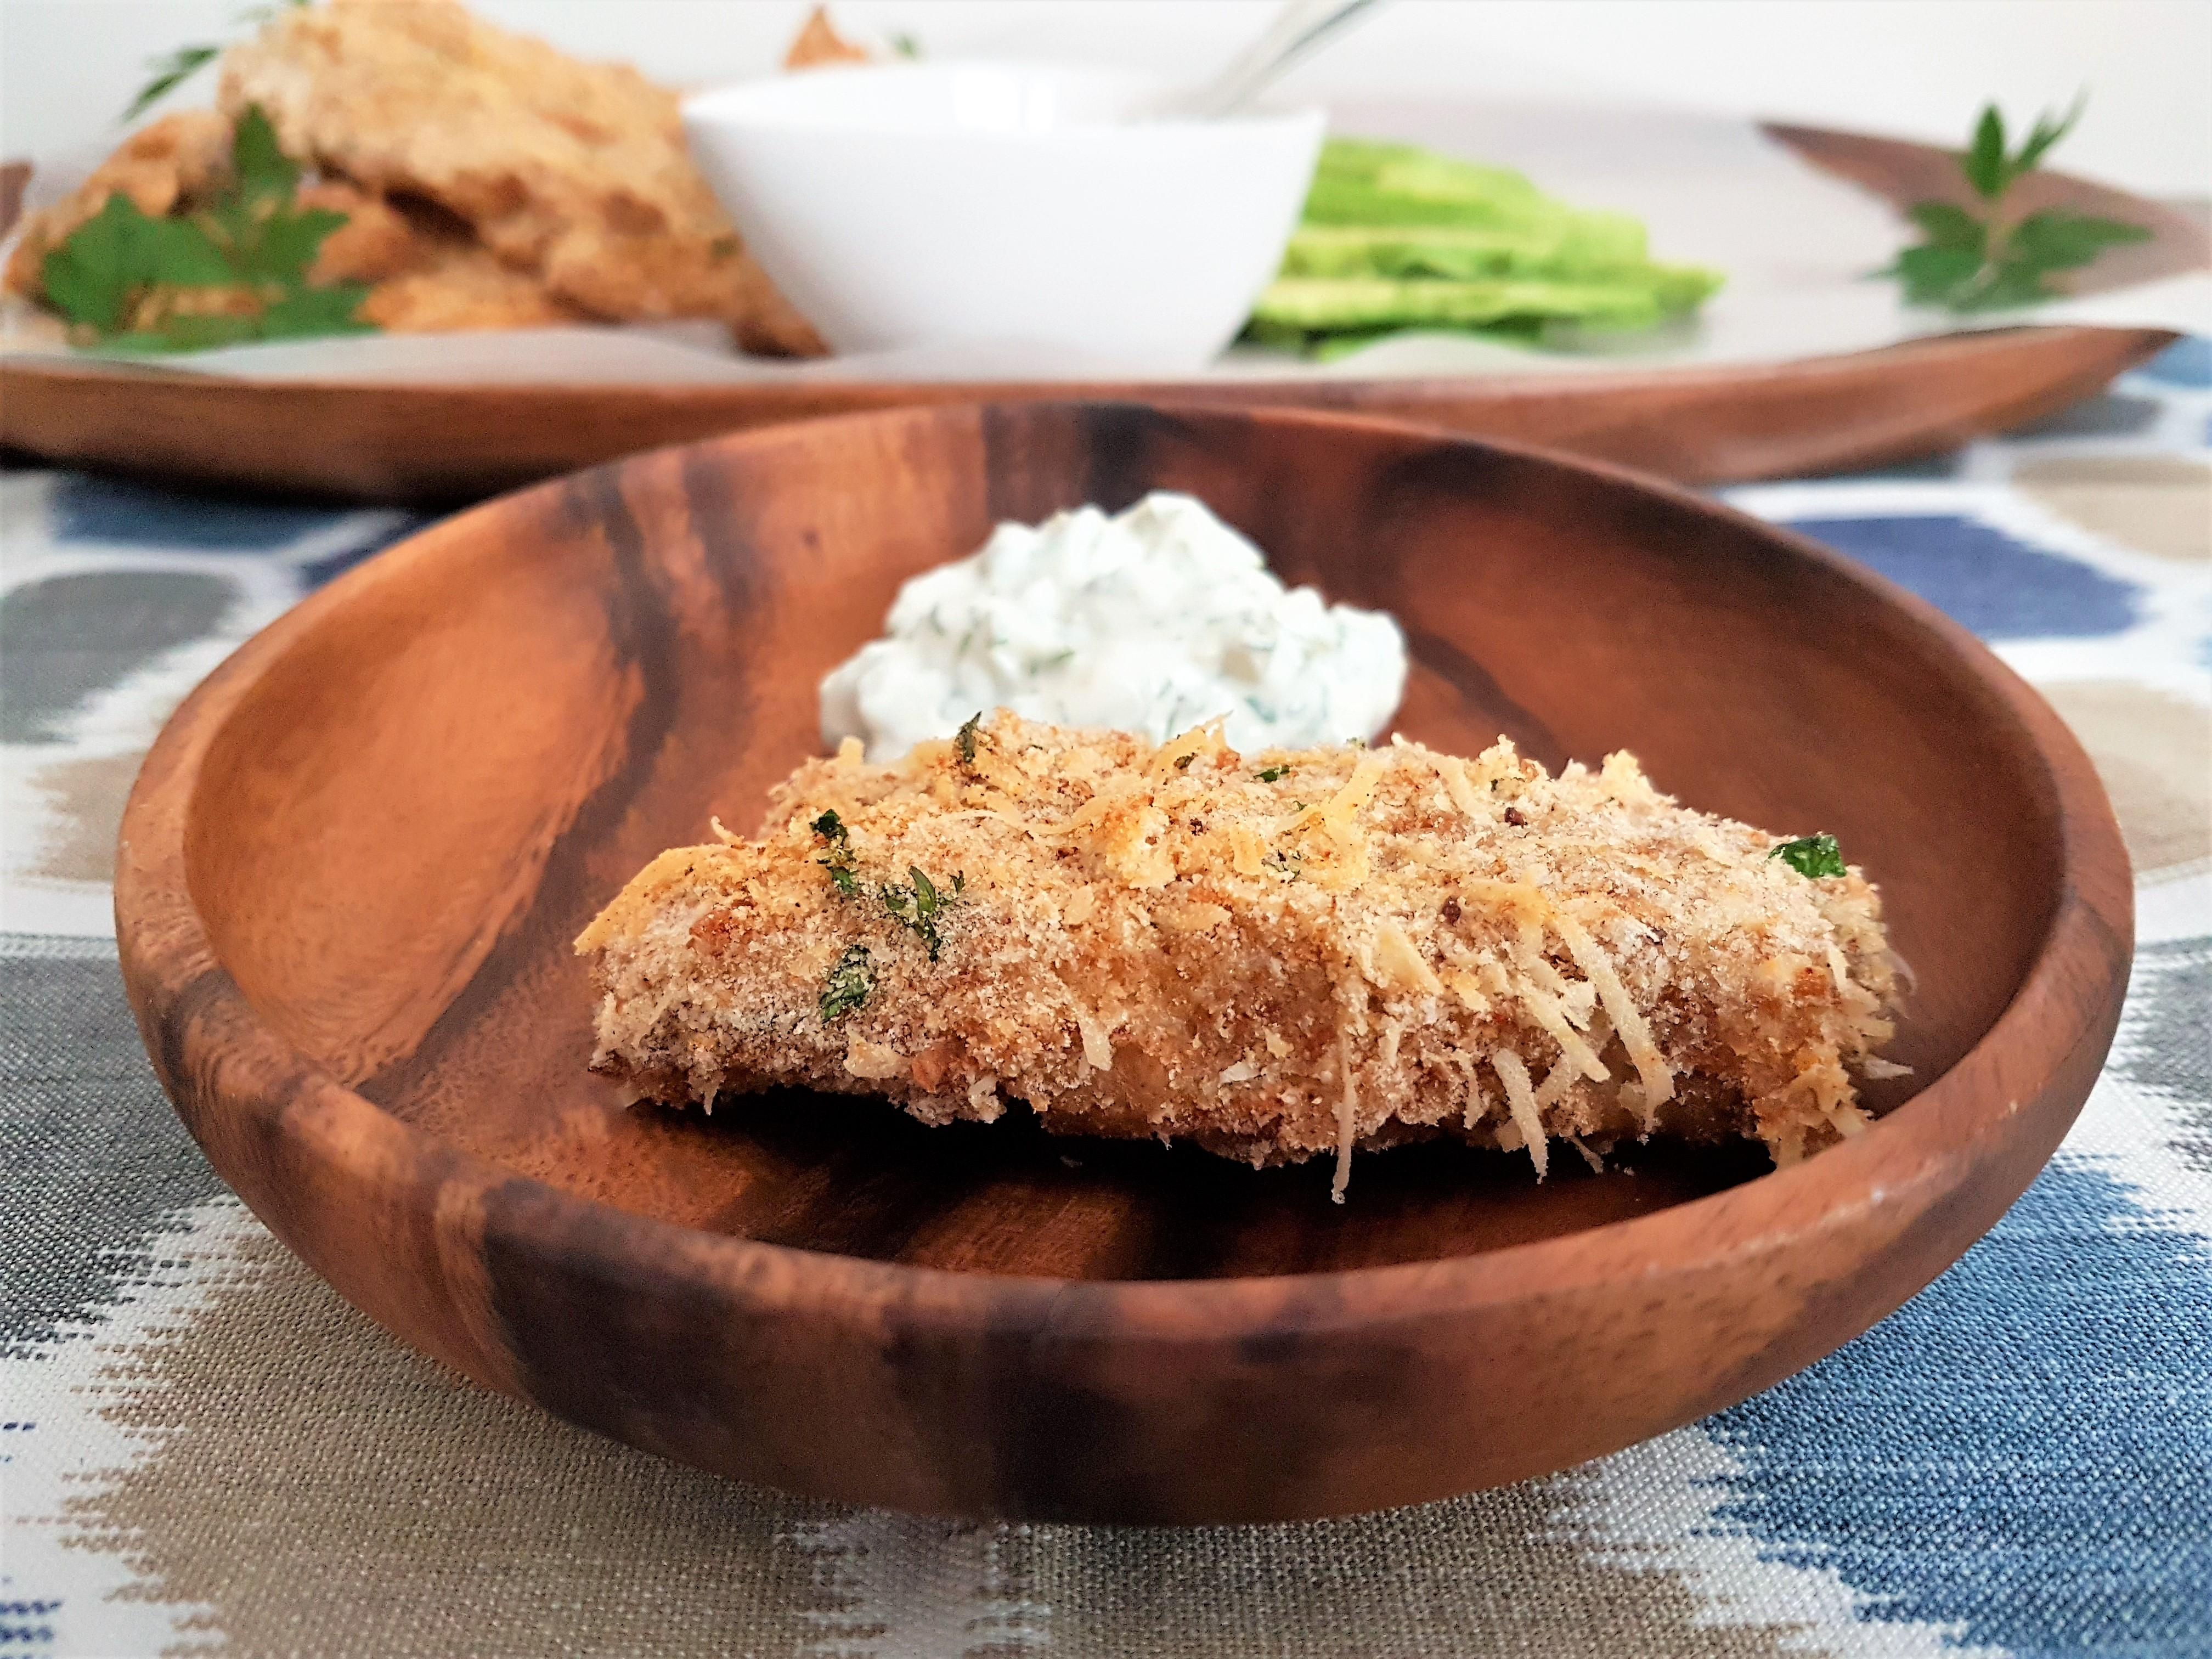 Deditos de pescado con salsa tártara/ Fish sticks with tartar sauce